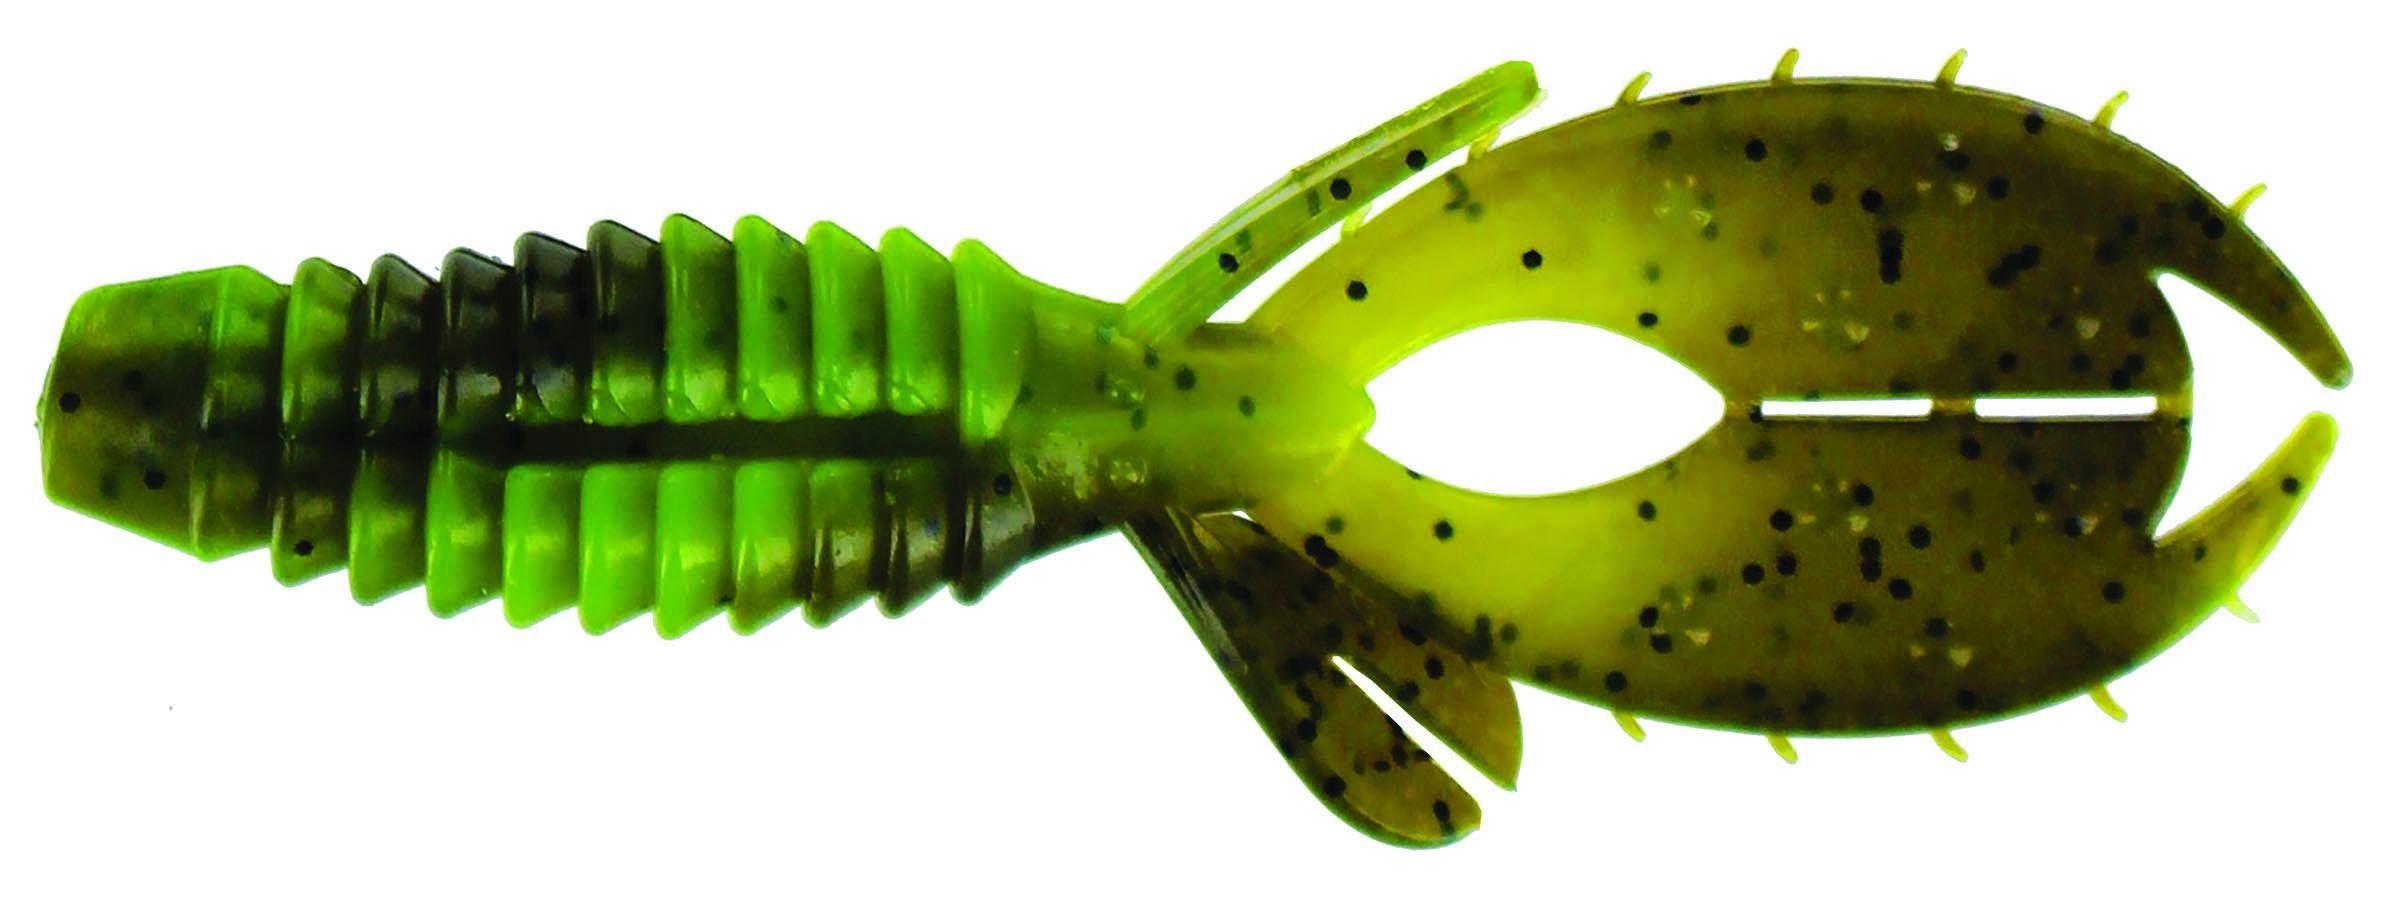 Big Bite Baits - YoMama - 4 inch - YO405 - GREEN PUMPKIN CHART SWIRL